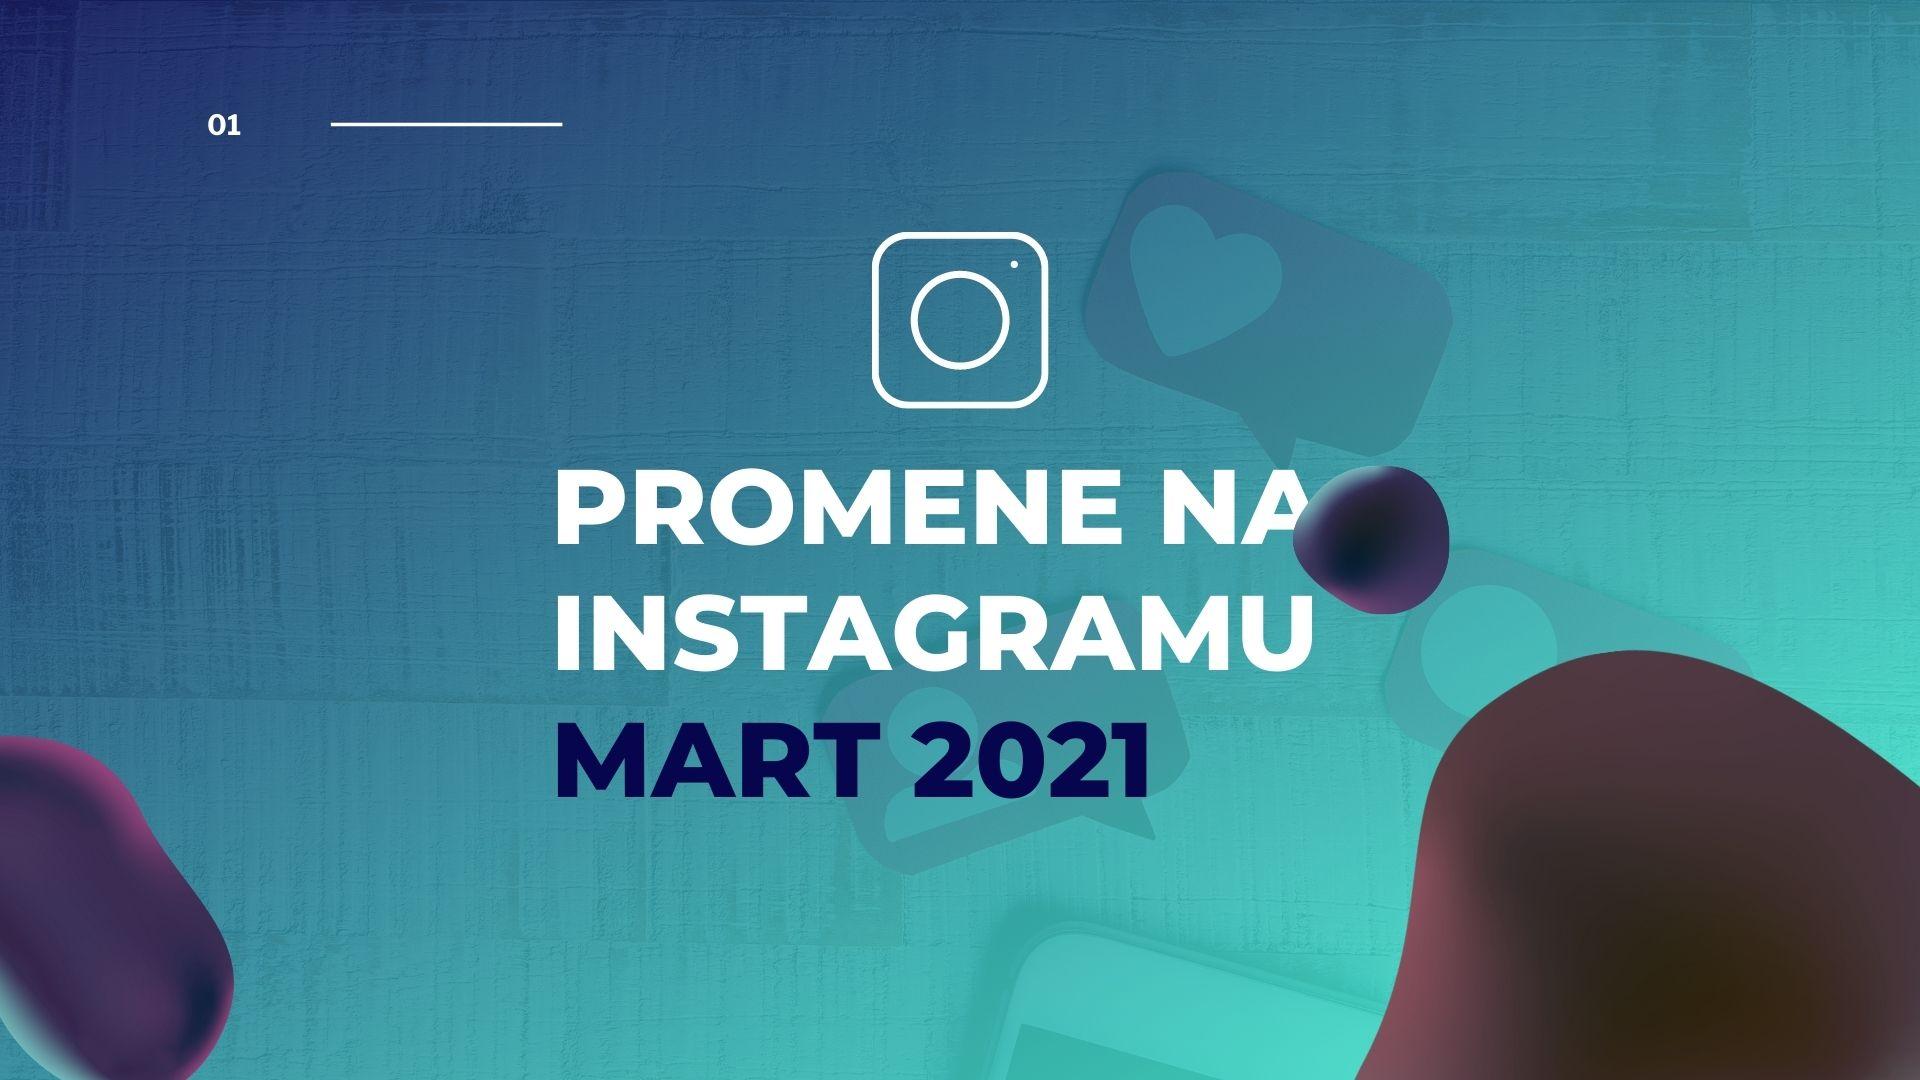 promene na instagramu mart 2021.jpg